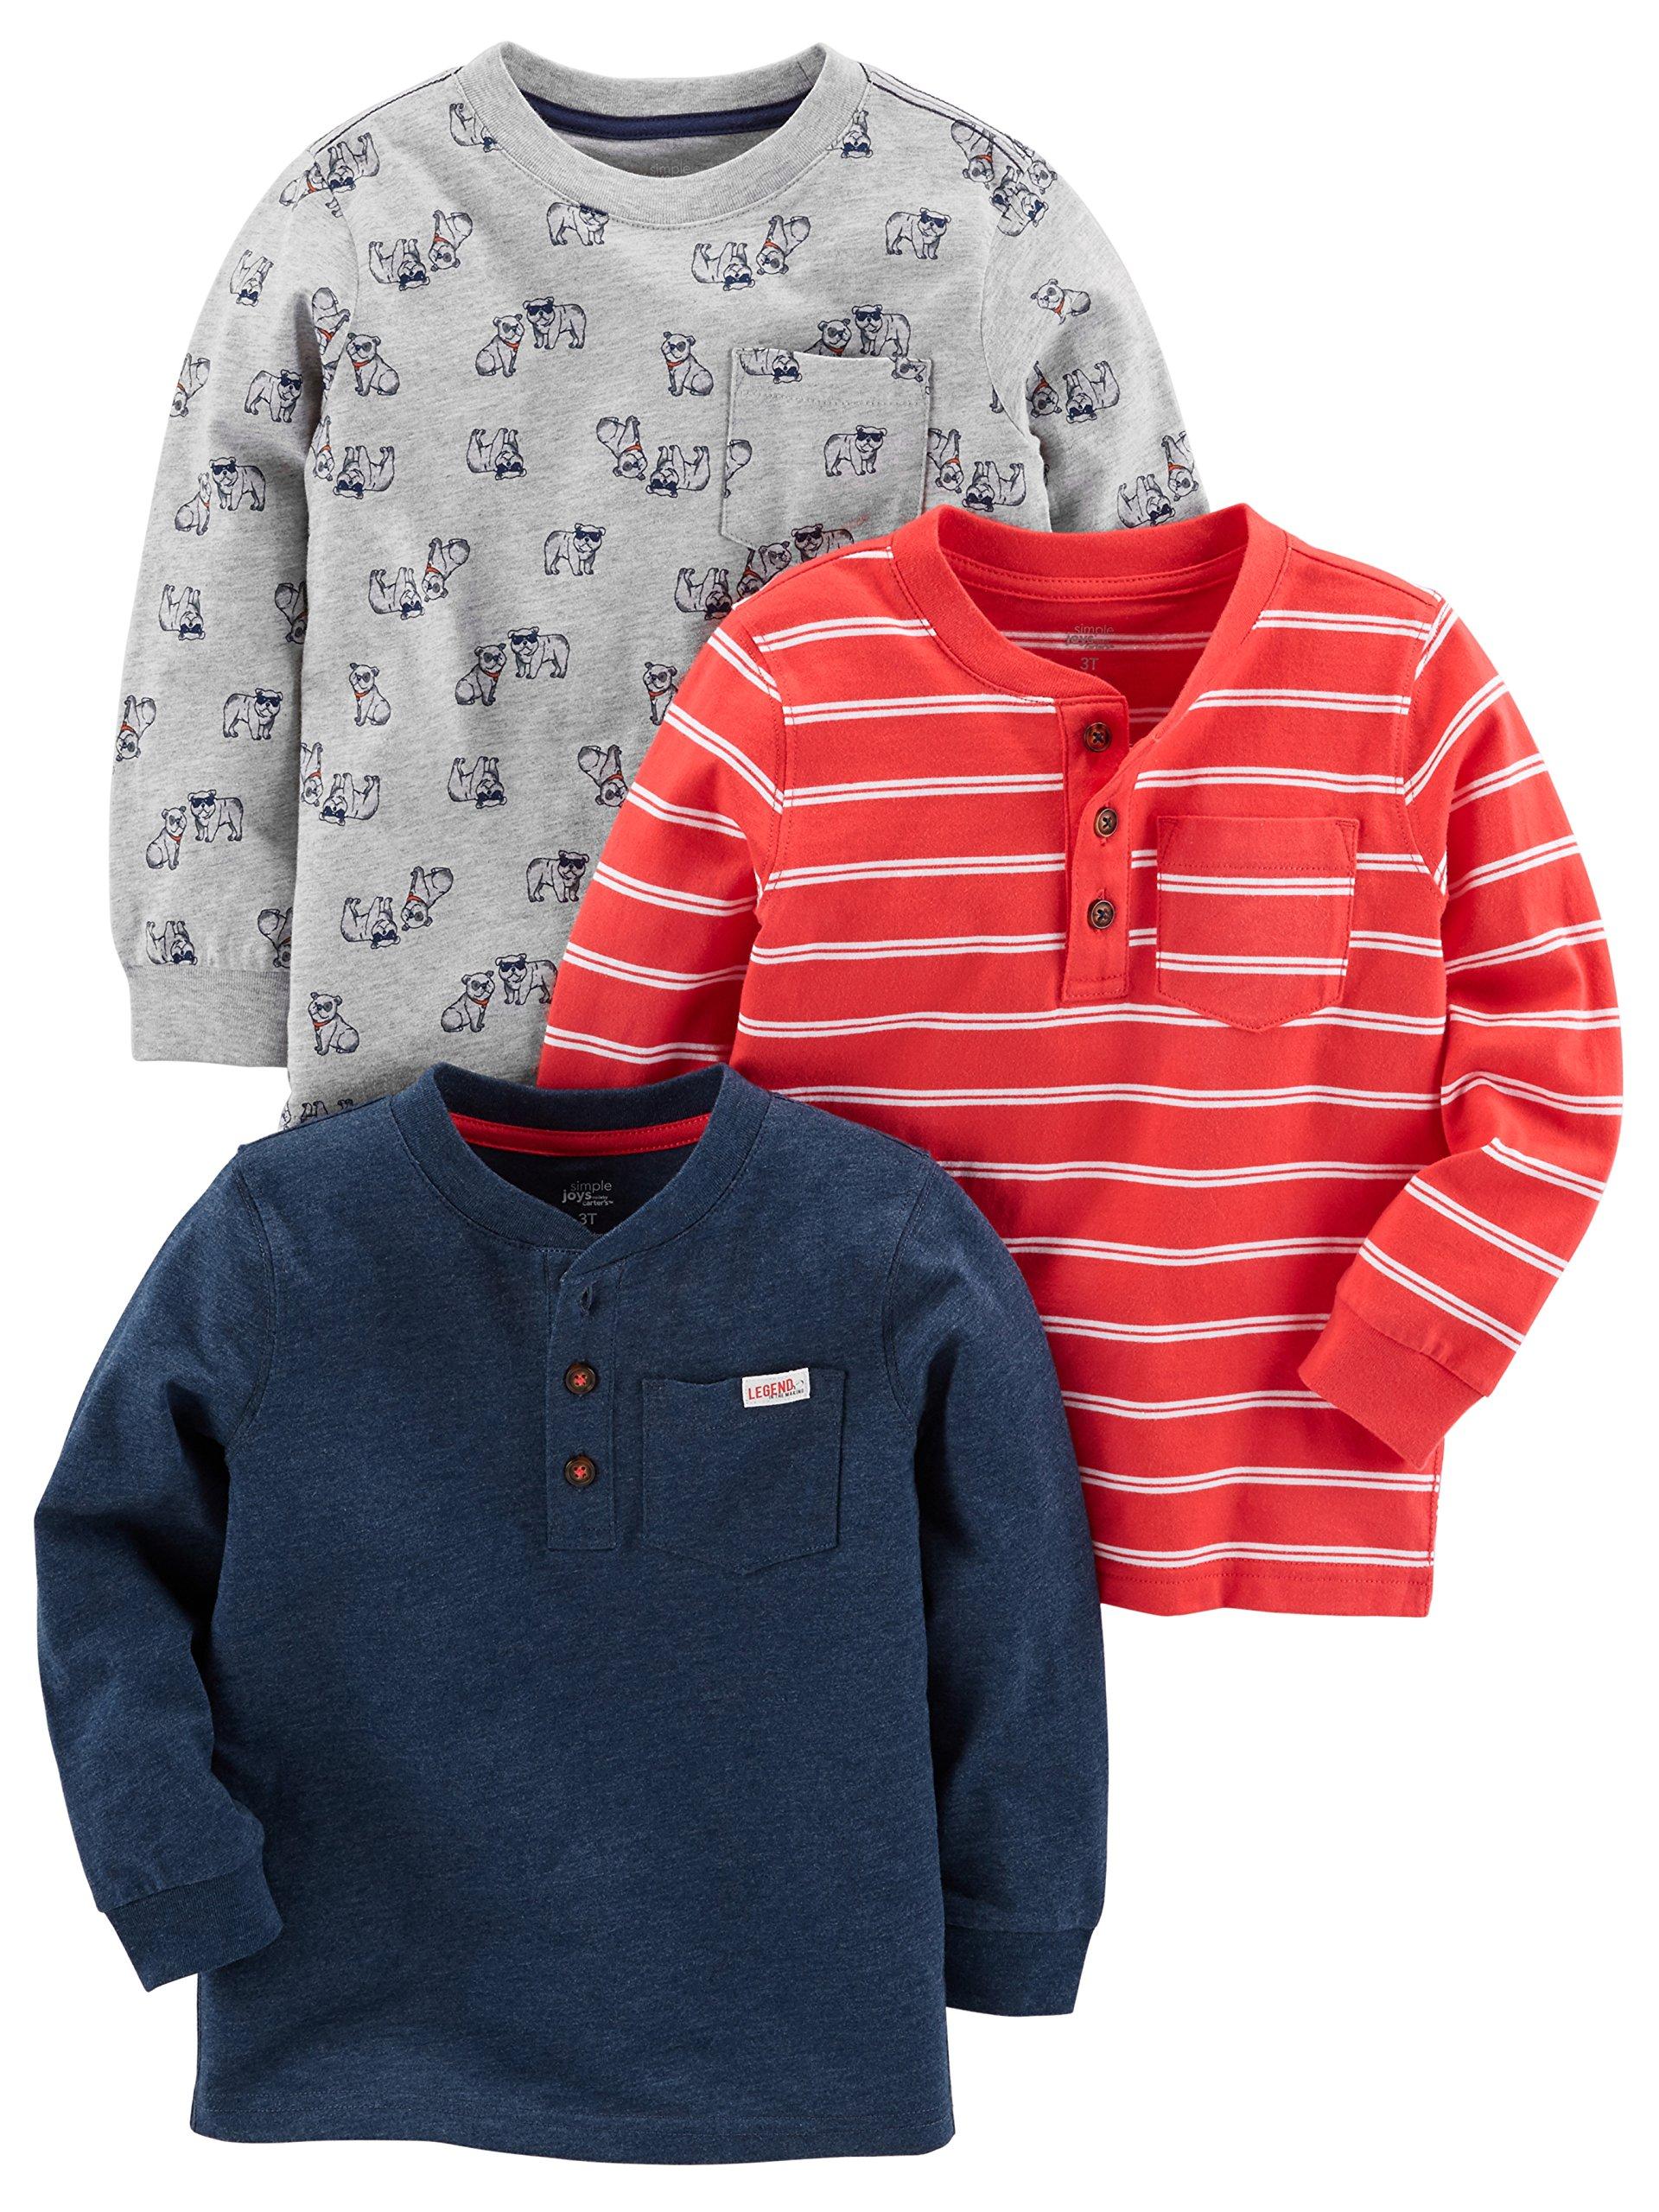 Simple Joys by Carter's Toddler Boys' 3-Pack Long Sleeve Shirt